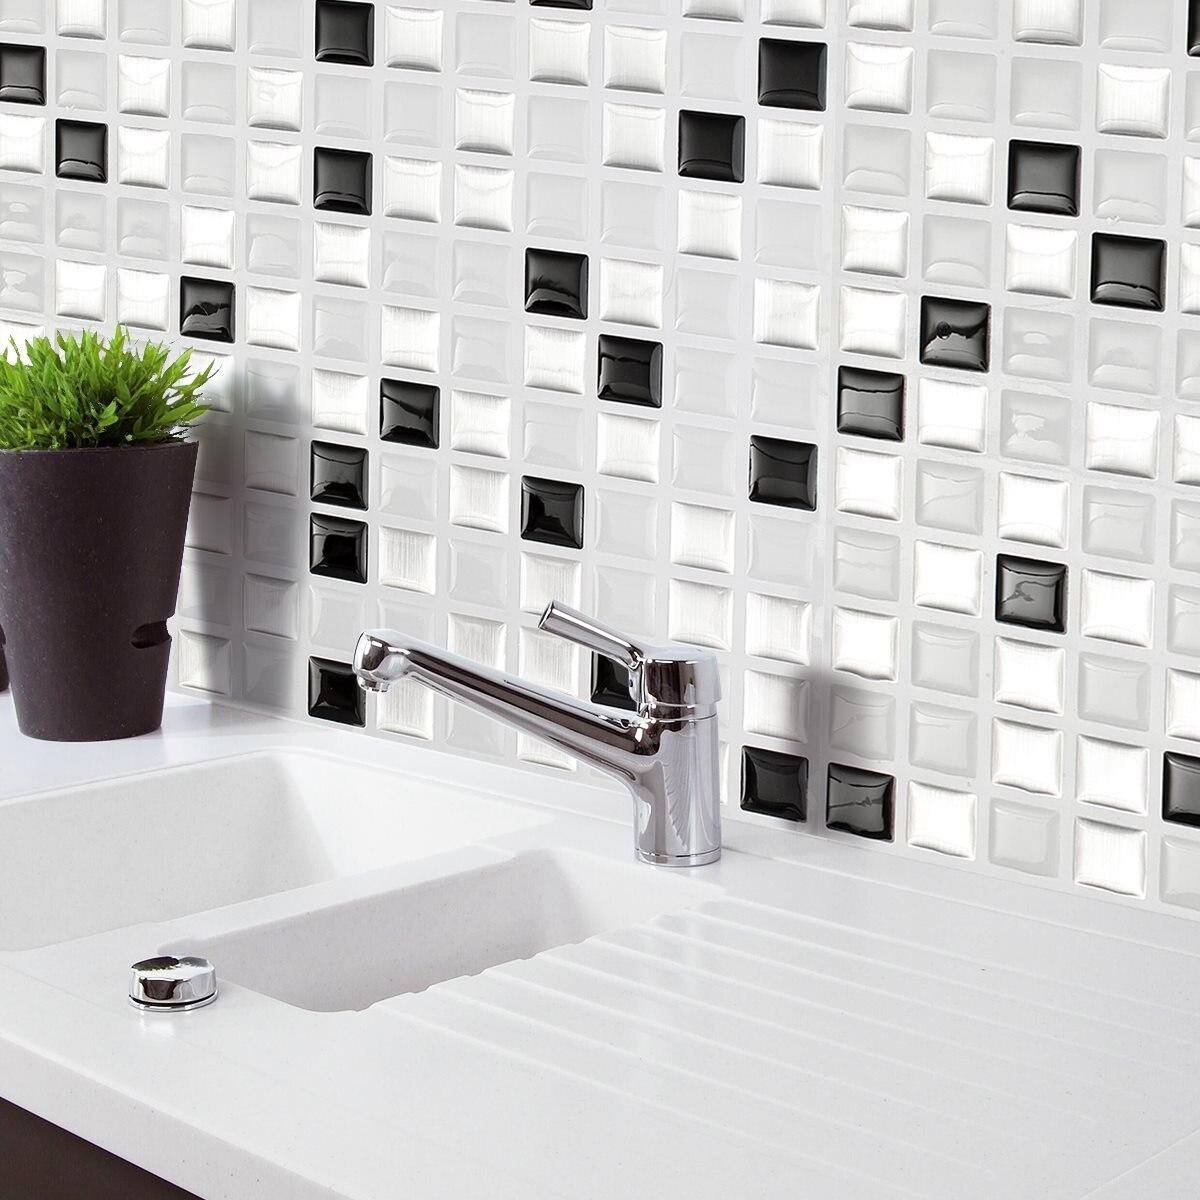 Wohnkultur Ziegel Mosaik Küche Bad Nagelfolie Schönheit 3D Tapete ...